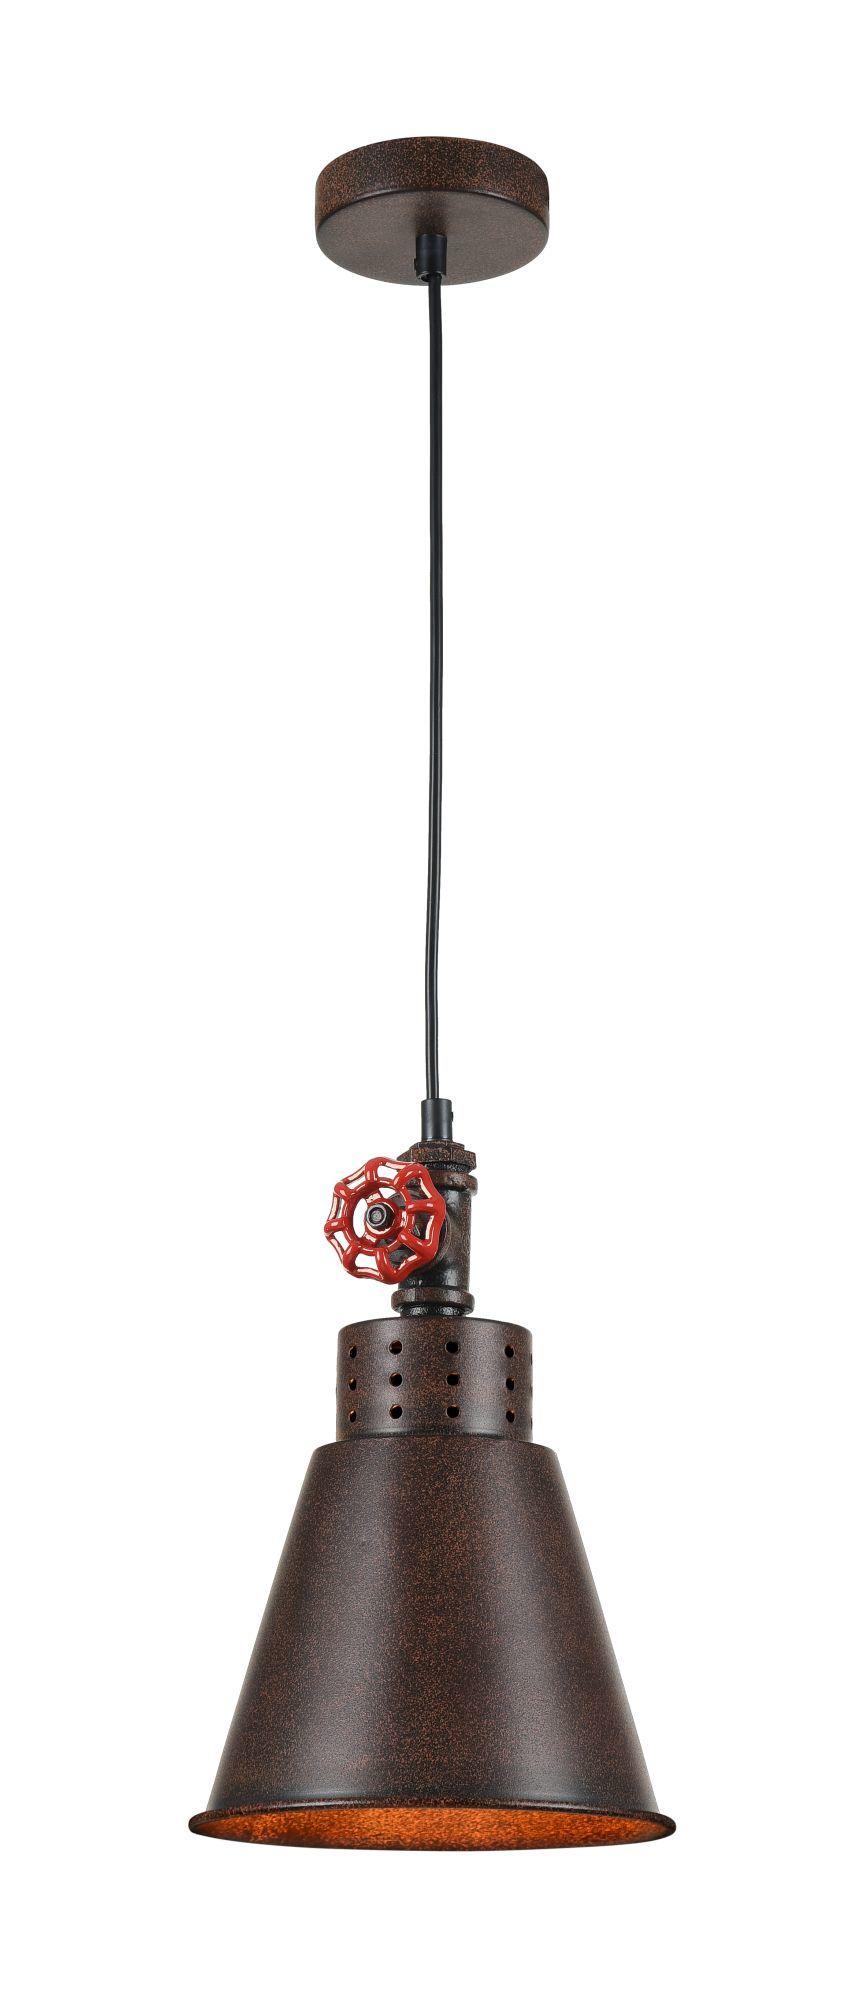 Подвесной светильник Maytoni Valve T020-01-R, 1xE27x60W, коричневый, металл - фото 1